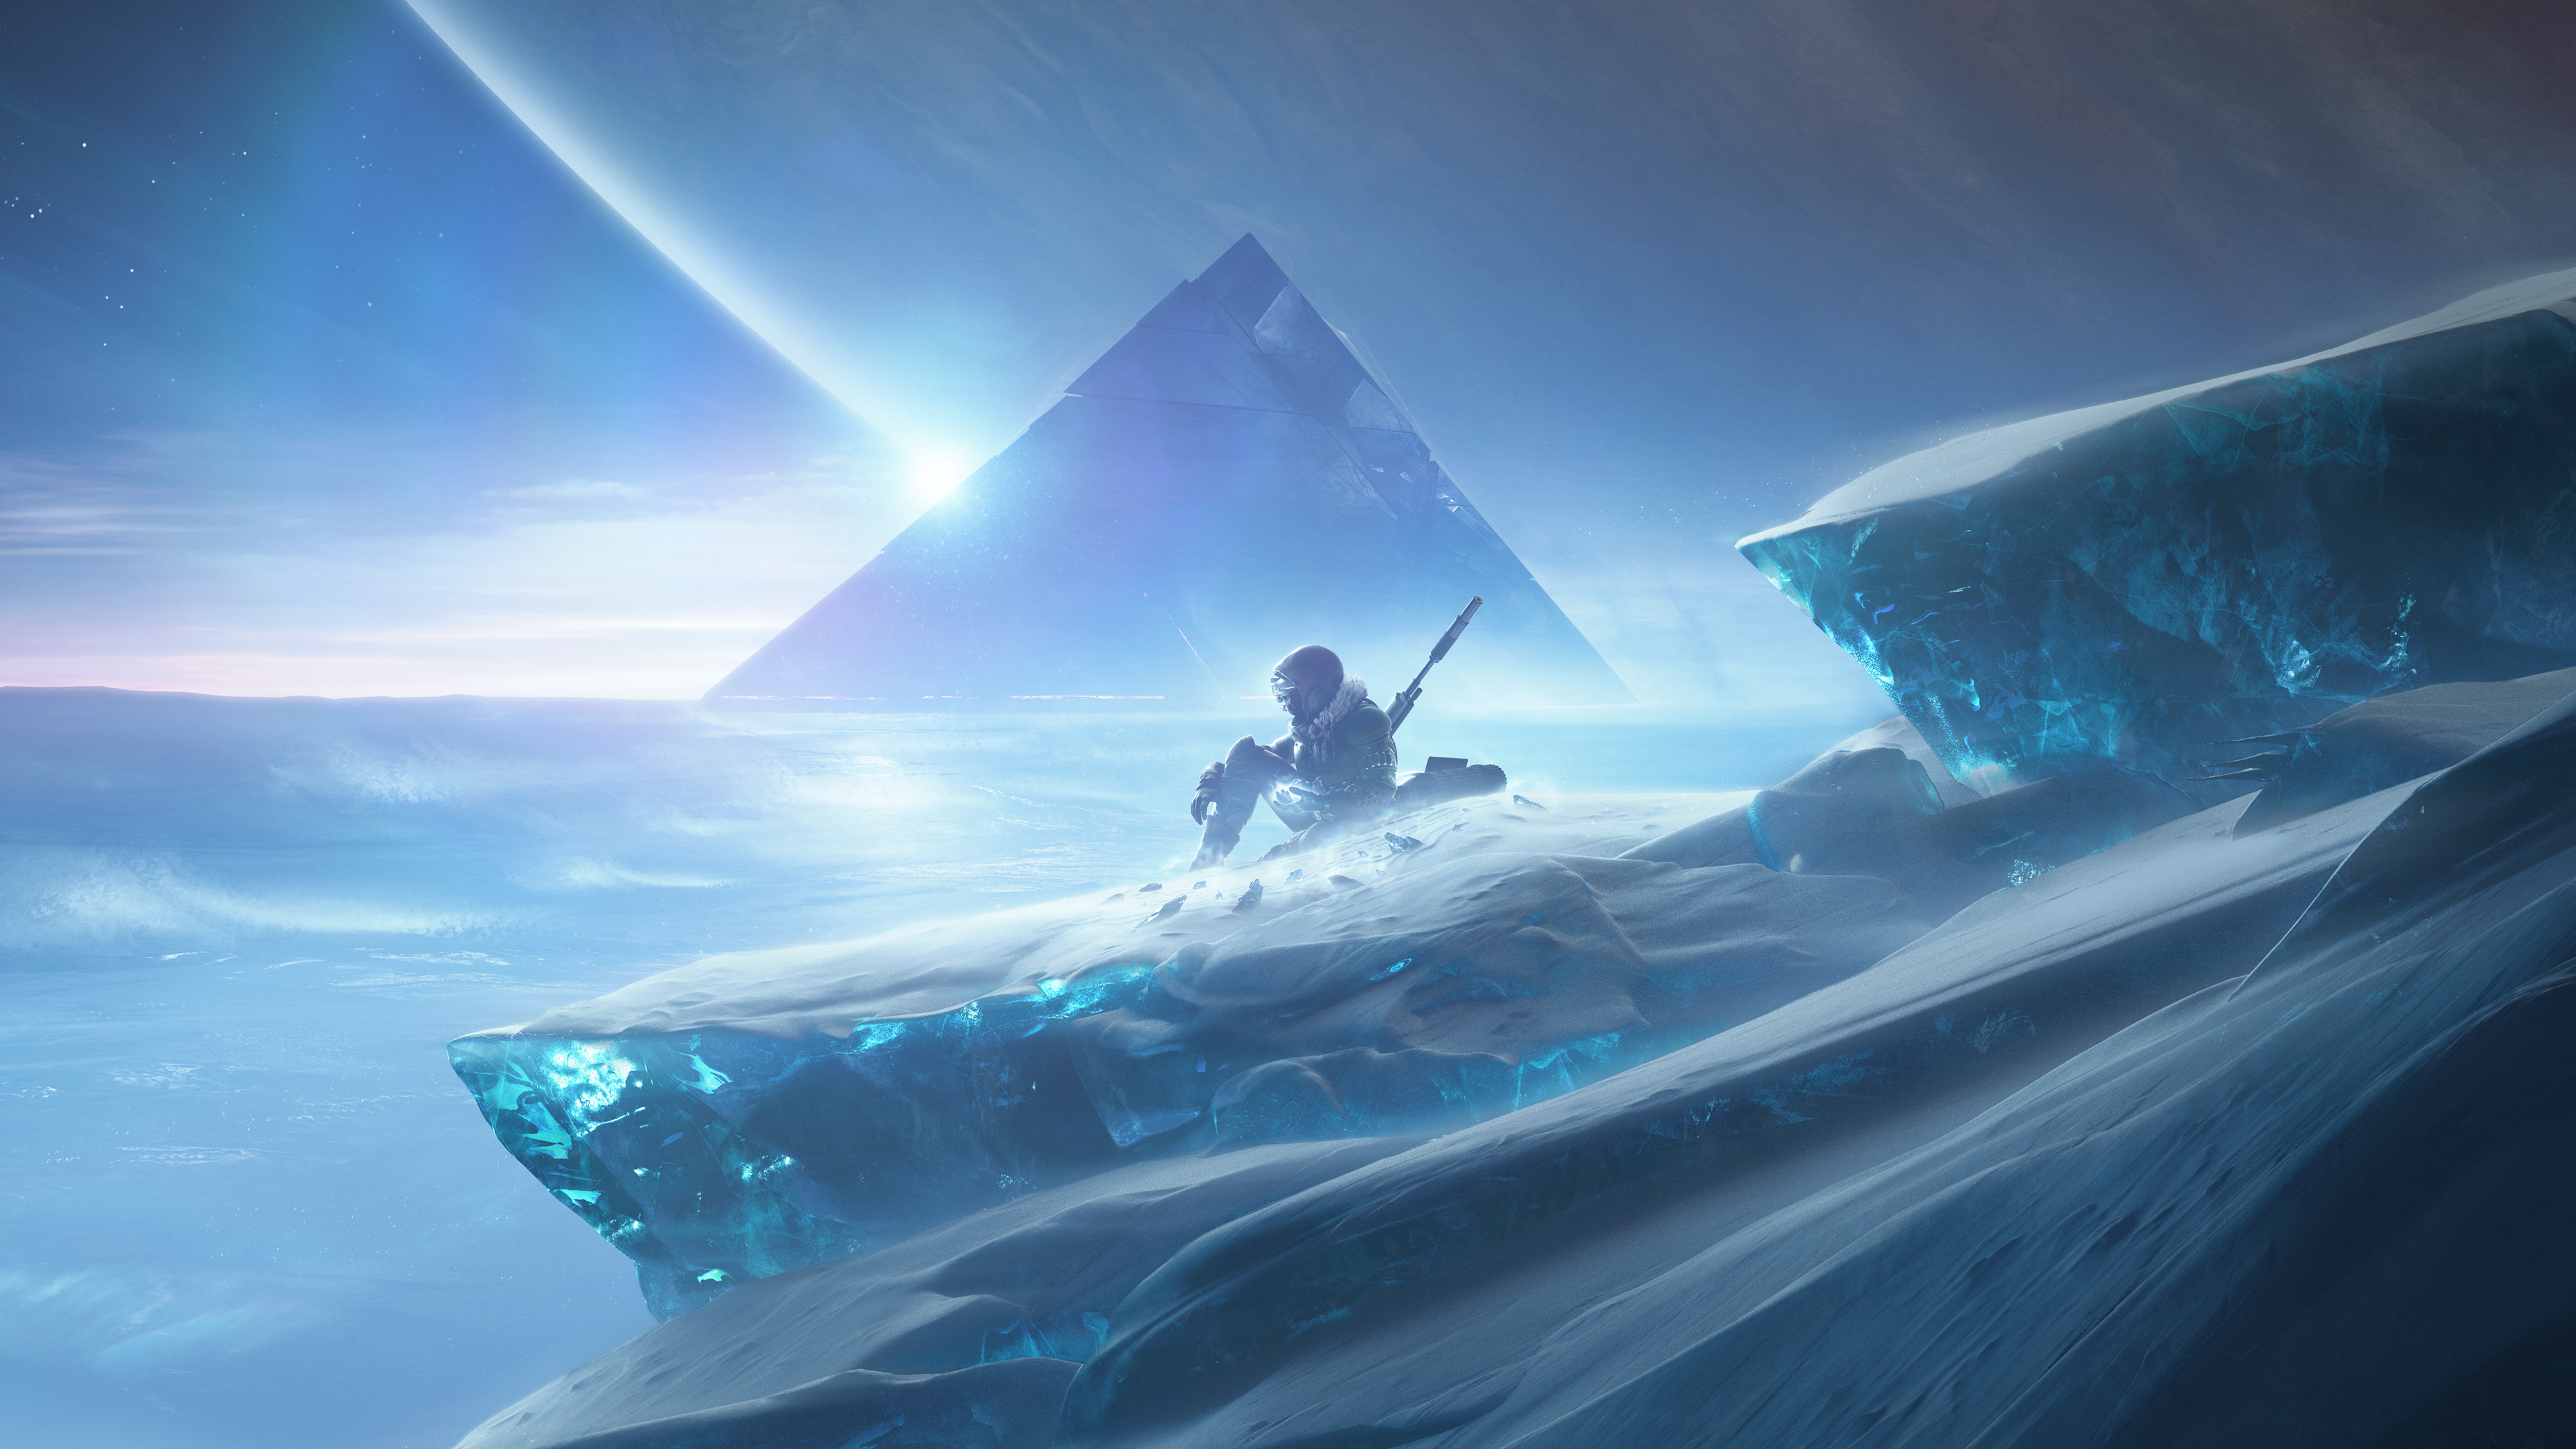 3840x2160 Destiny 2 Beyond Light 2020 4k HD 4k Wallpapers ...